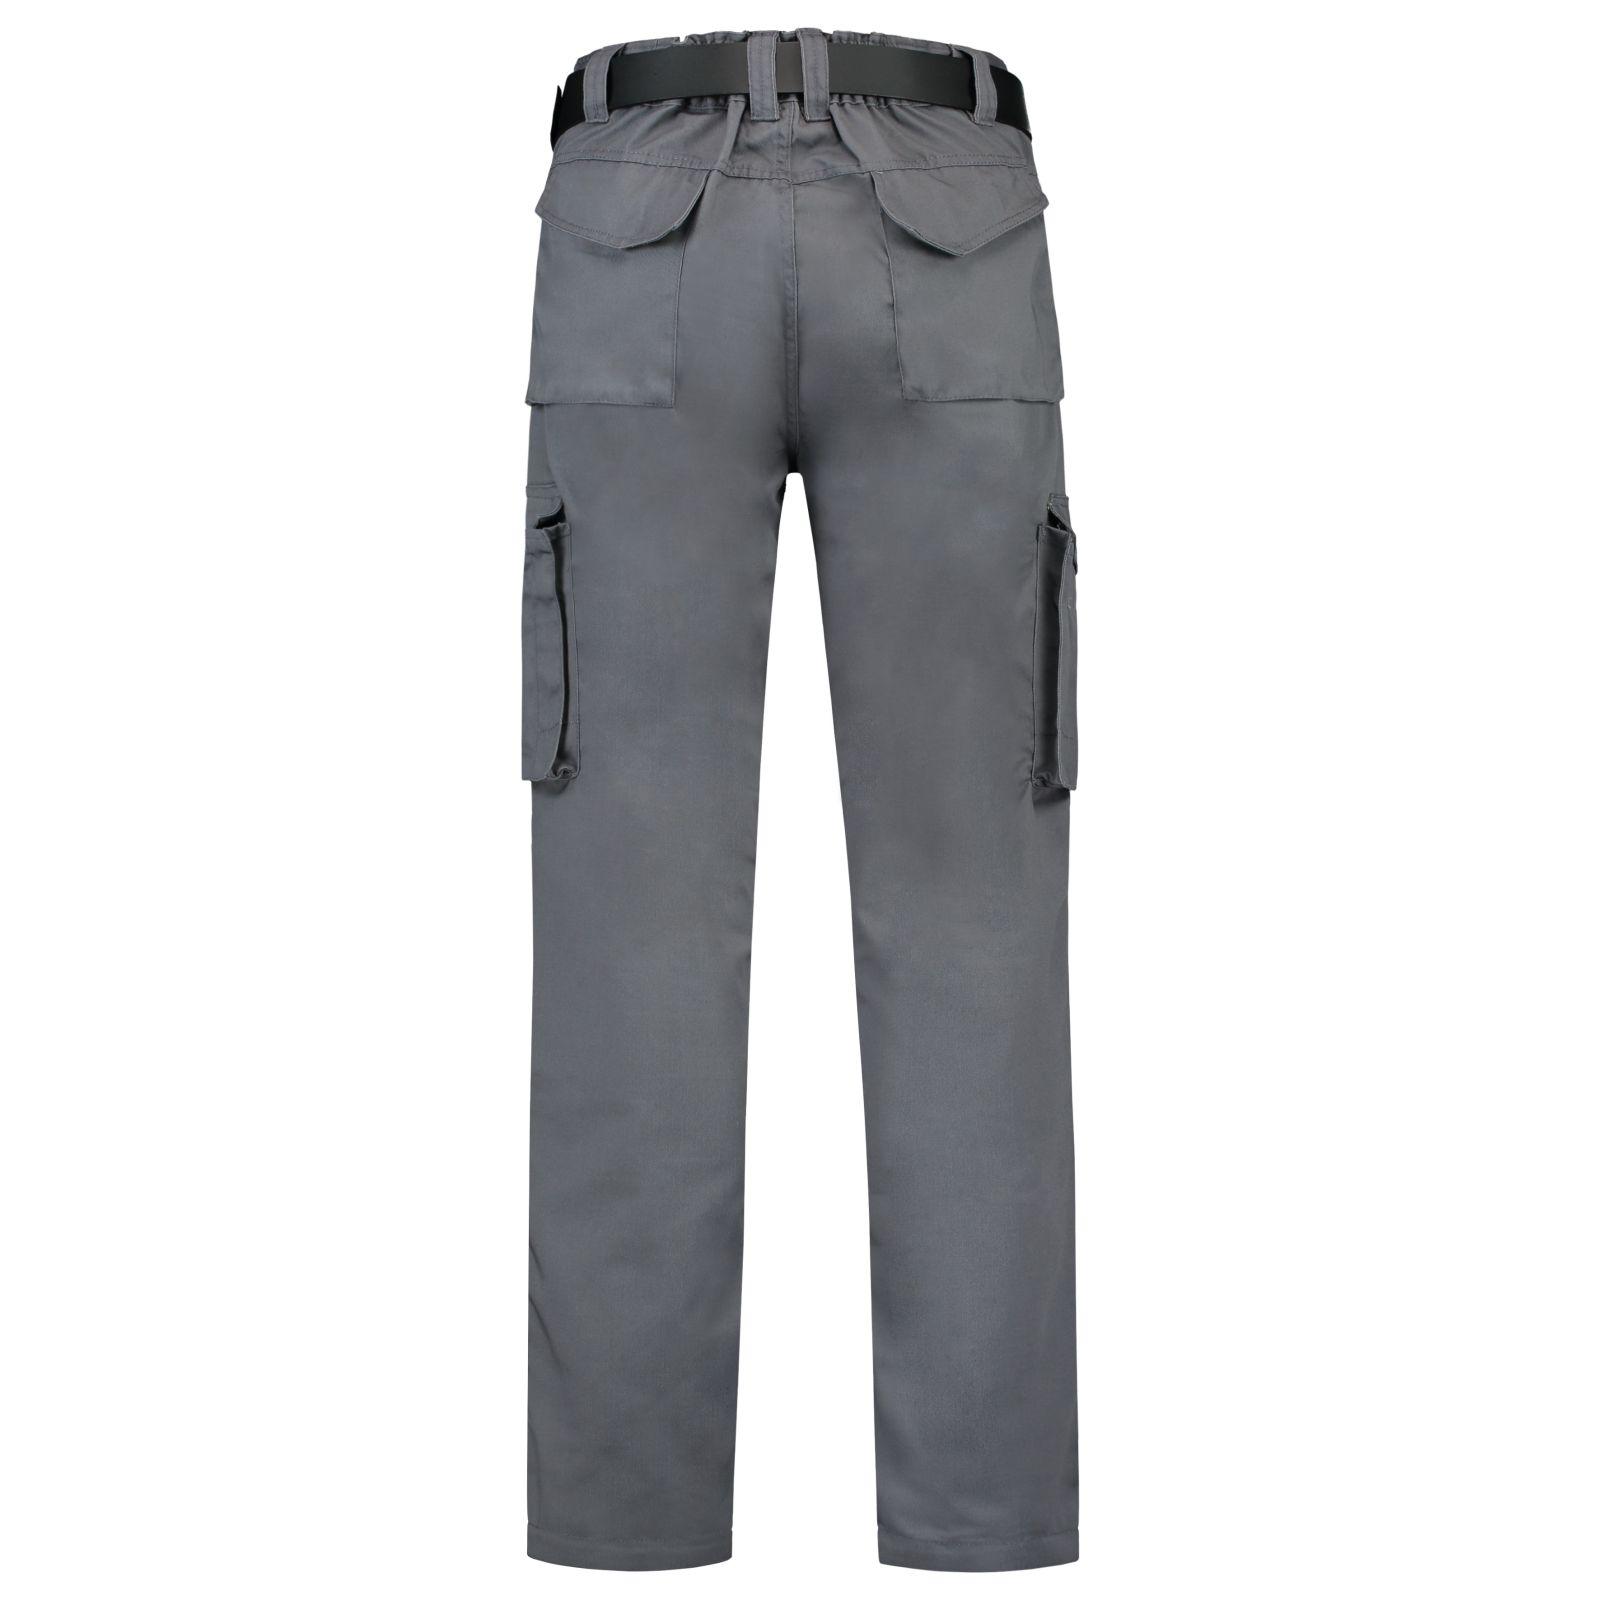 Tricorp Workwear Broeken 502008-TUB2000 konvooigrijs(Convoygrey)